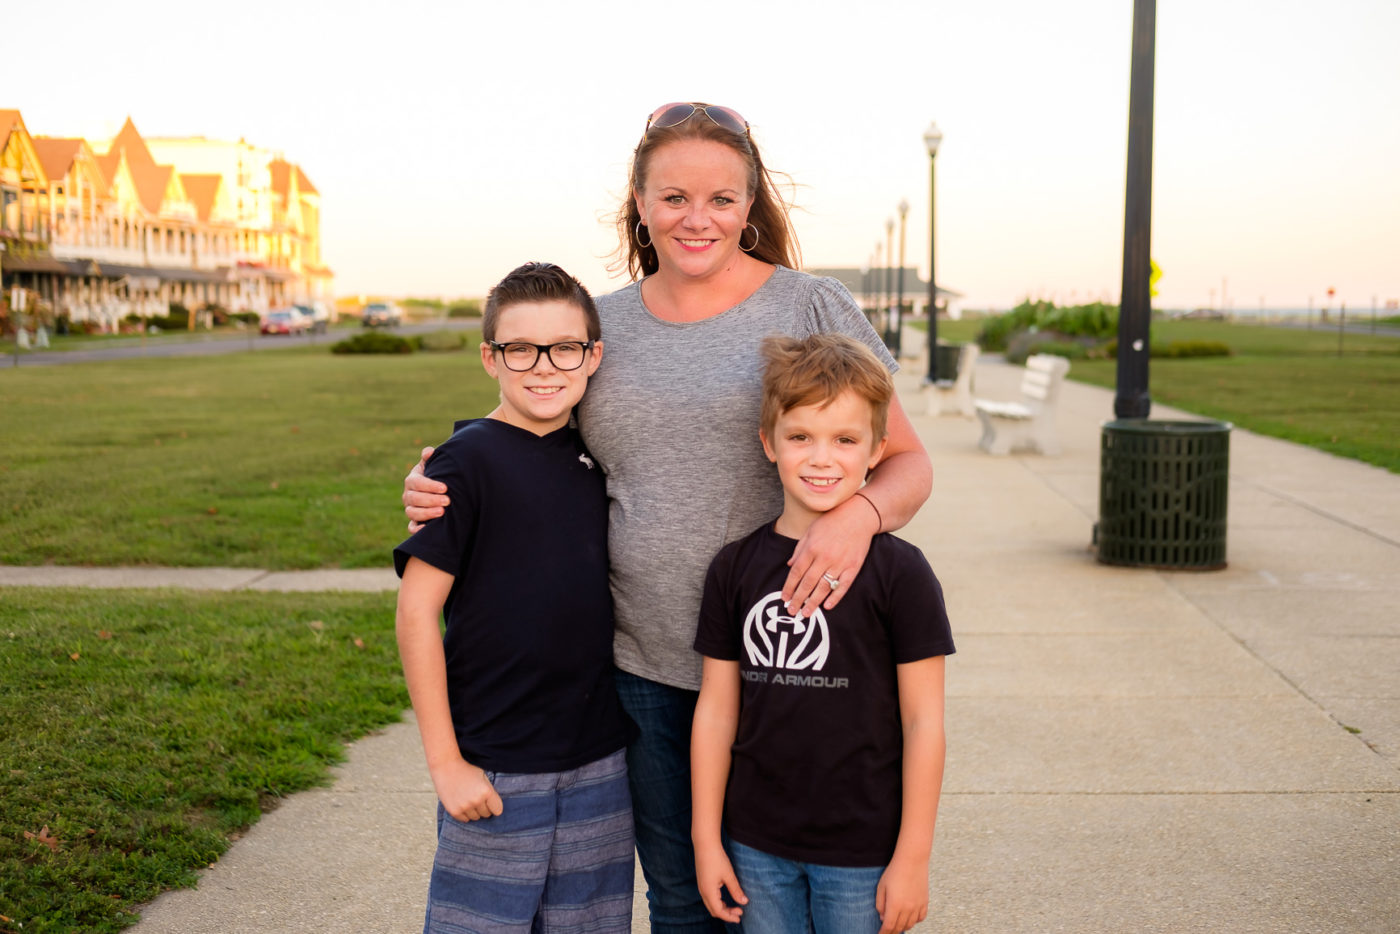 Portraits of the Jersey Shore Jersey Shore Neuroblastoma Boy Robert Wood Johnson Cancer Survivor_